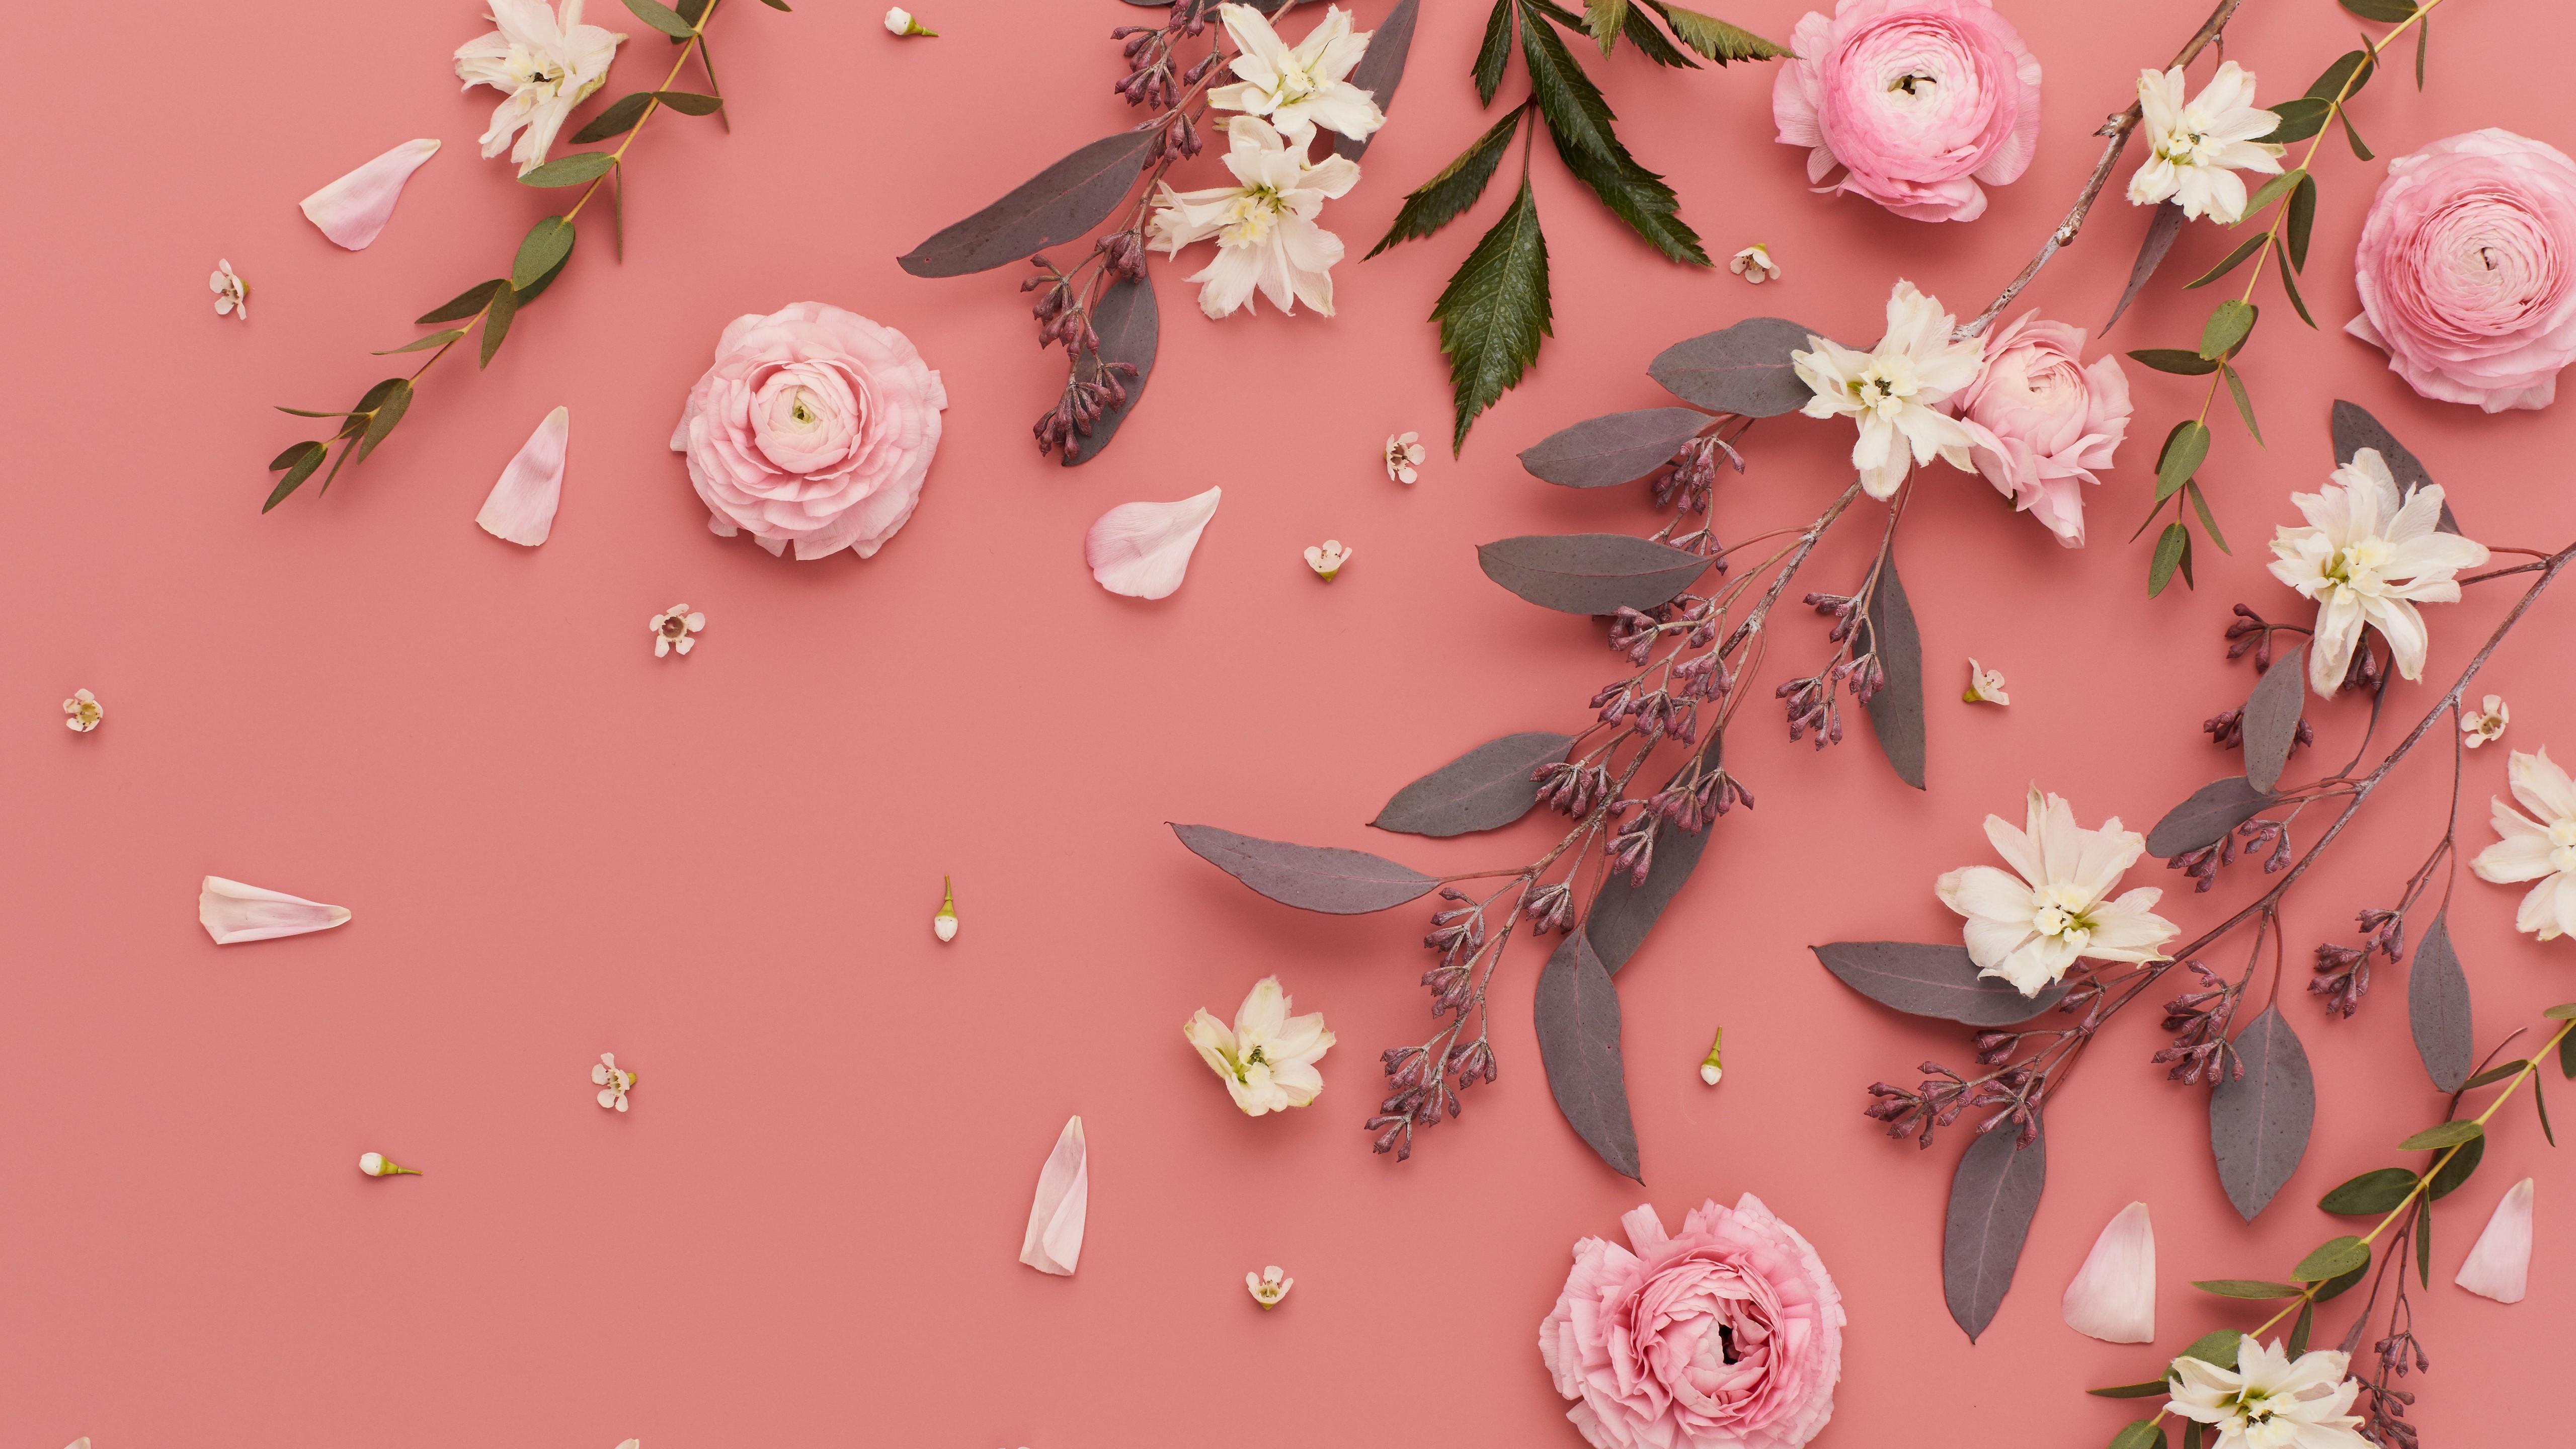 Nice - Beautiful Wallpapers Desktop Flower Background Hd , HD Wallpaper & Backgrounds